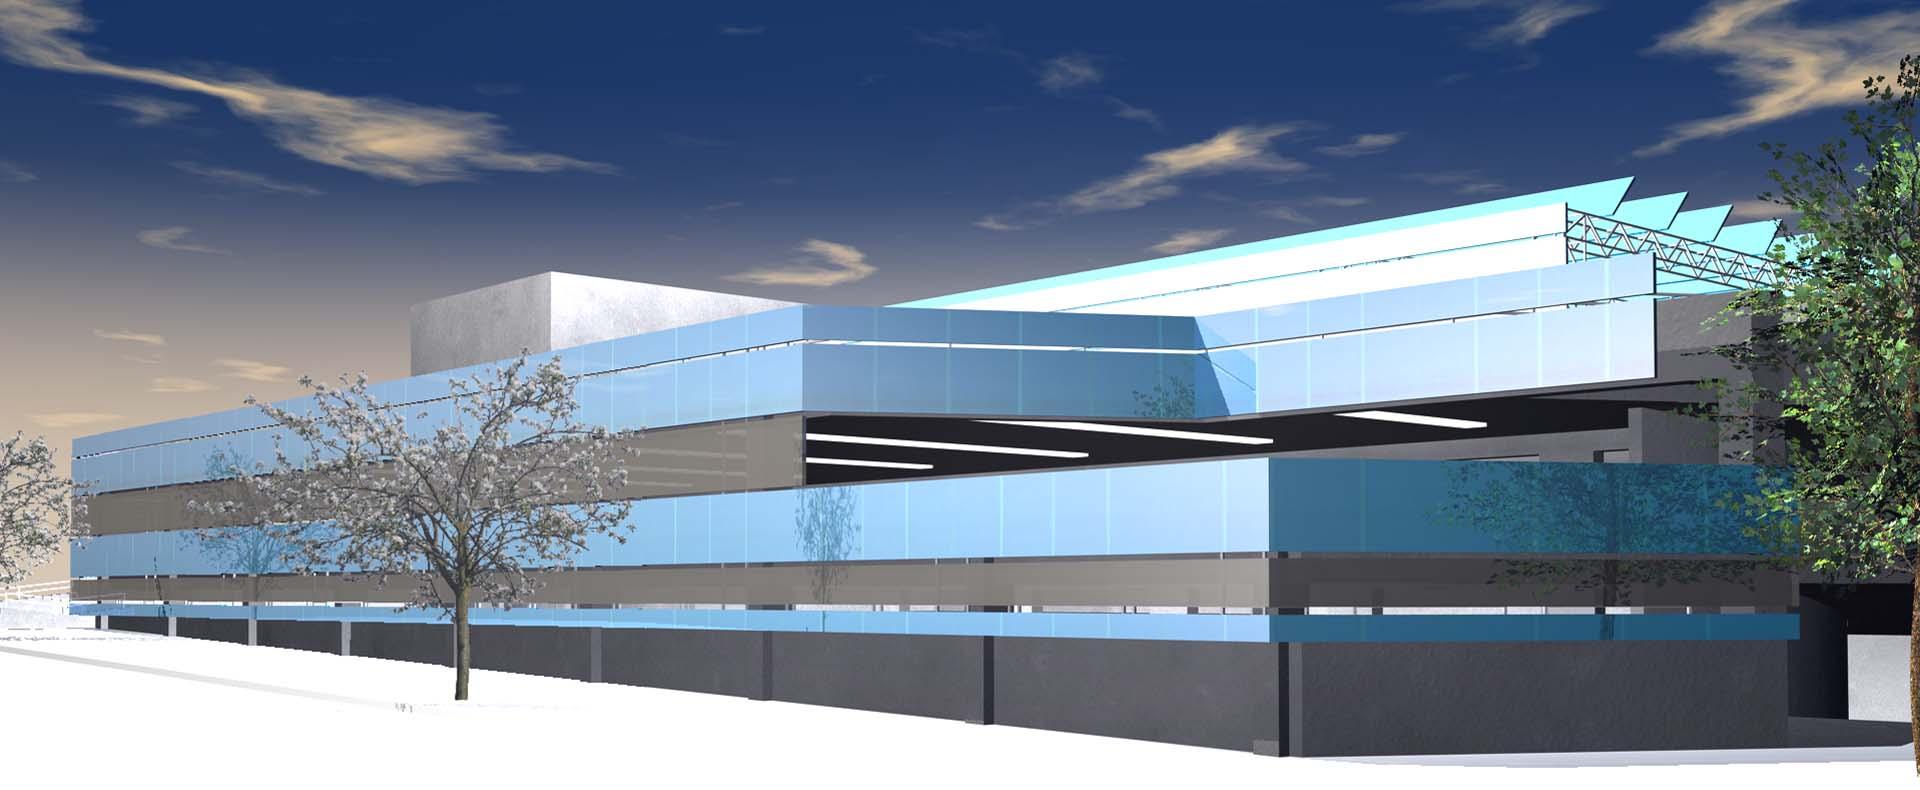 Konzept Parkhaus Bad Wildbad , Konzept 2008, Fassade als Photovolteik